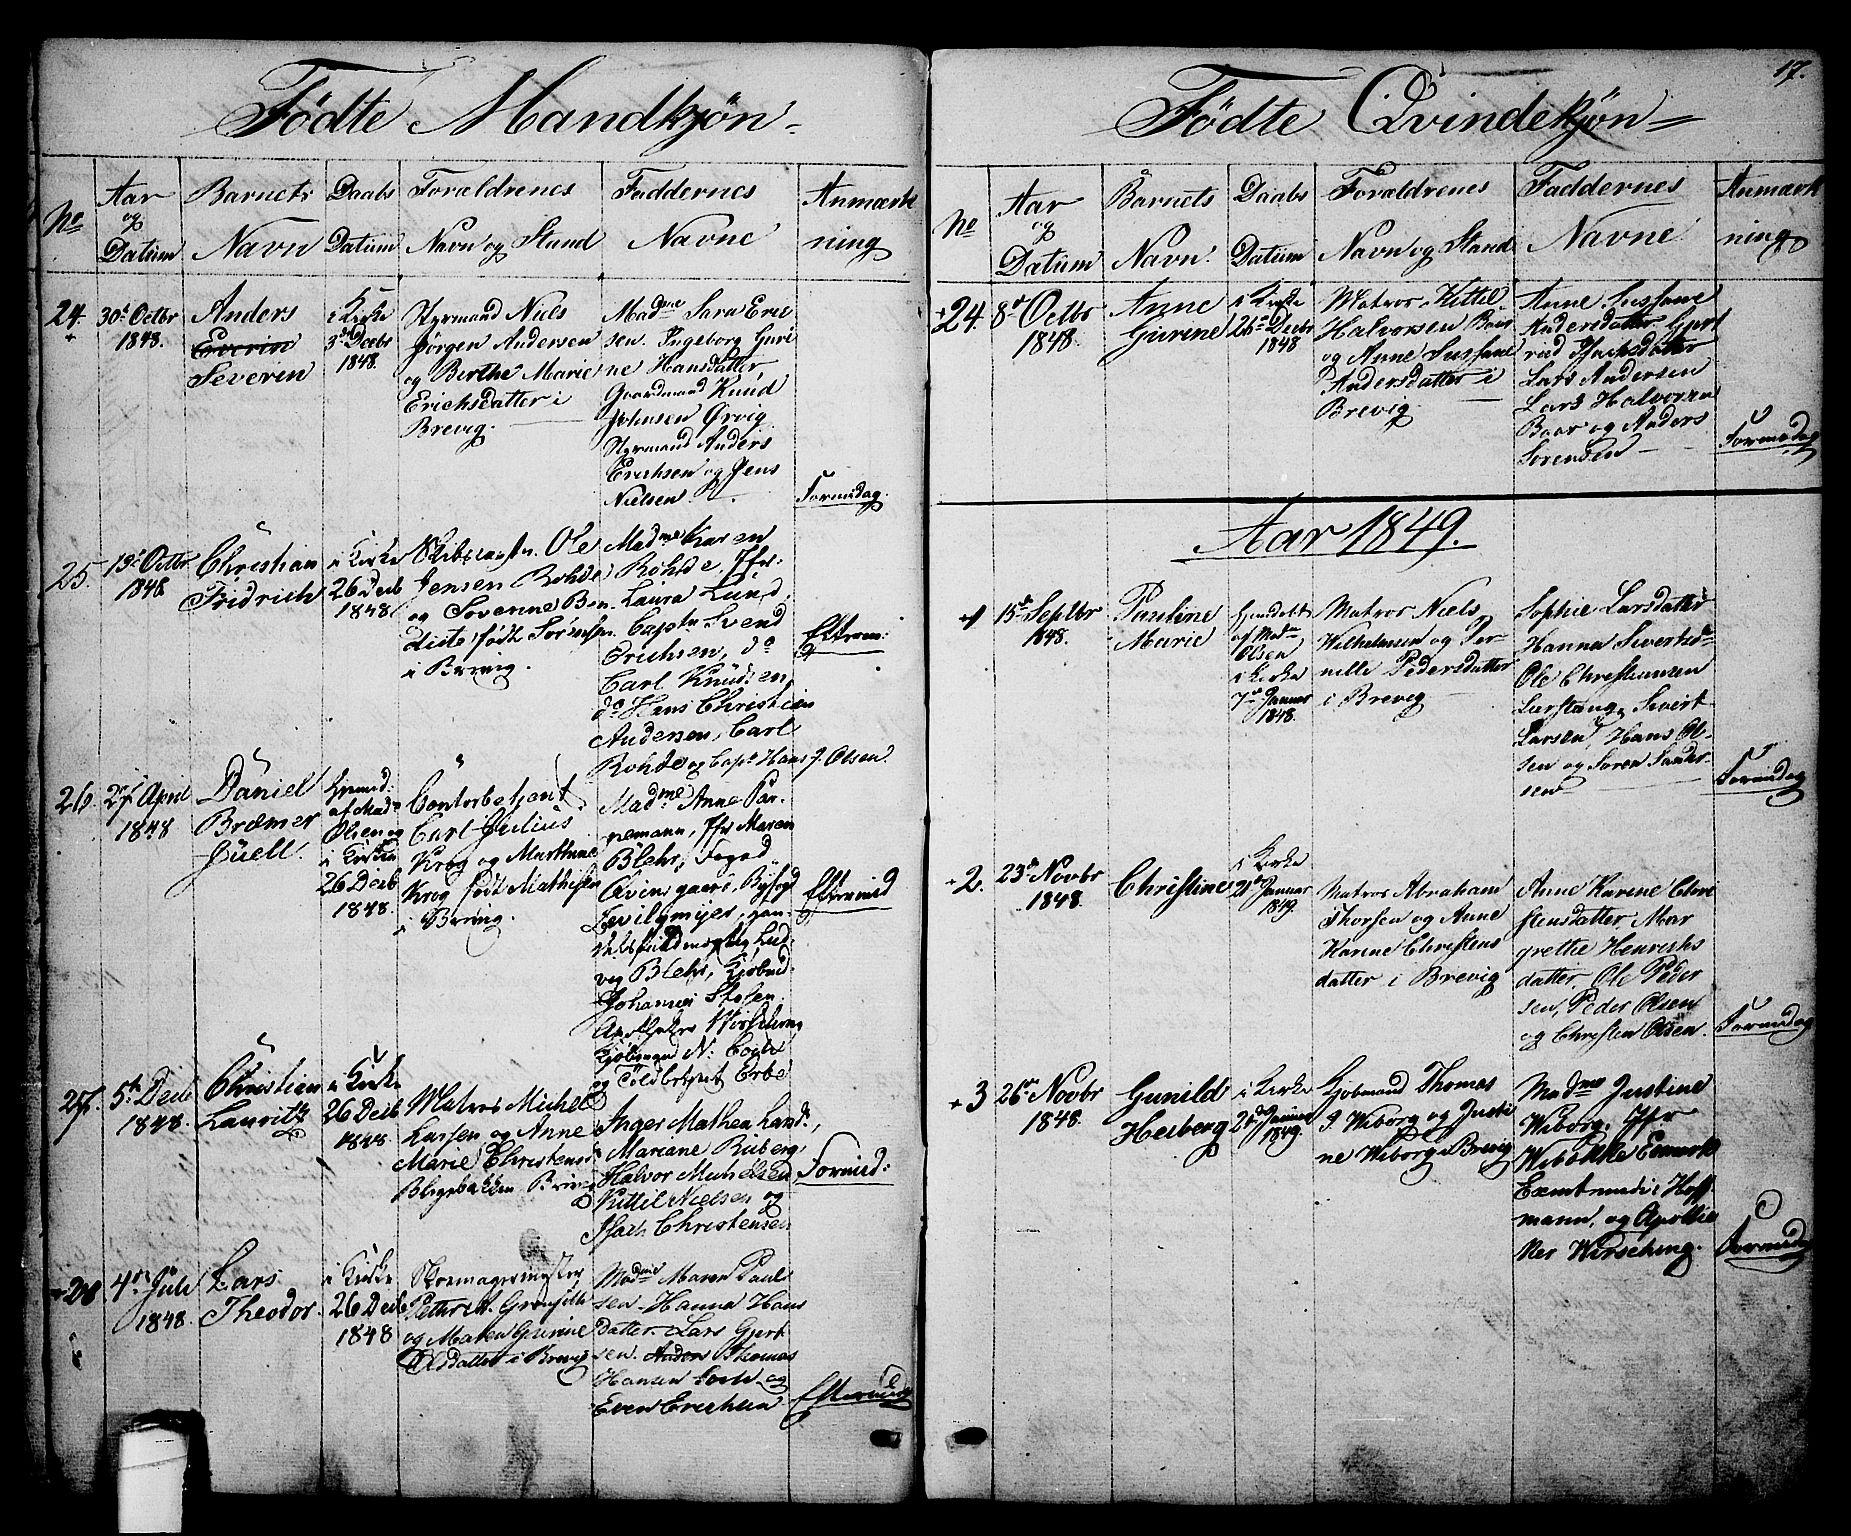 SAKO, Brevik kirkebøker, G/Ga/L0002: Klokkerbok nr. 2, 1846-1865, s. 17